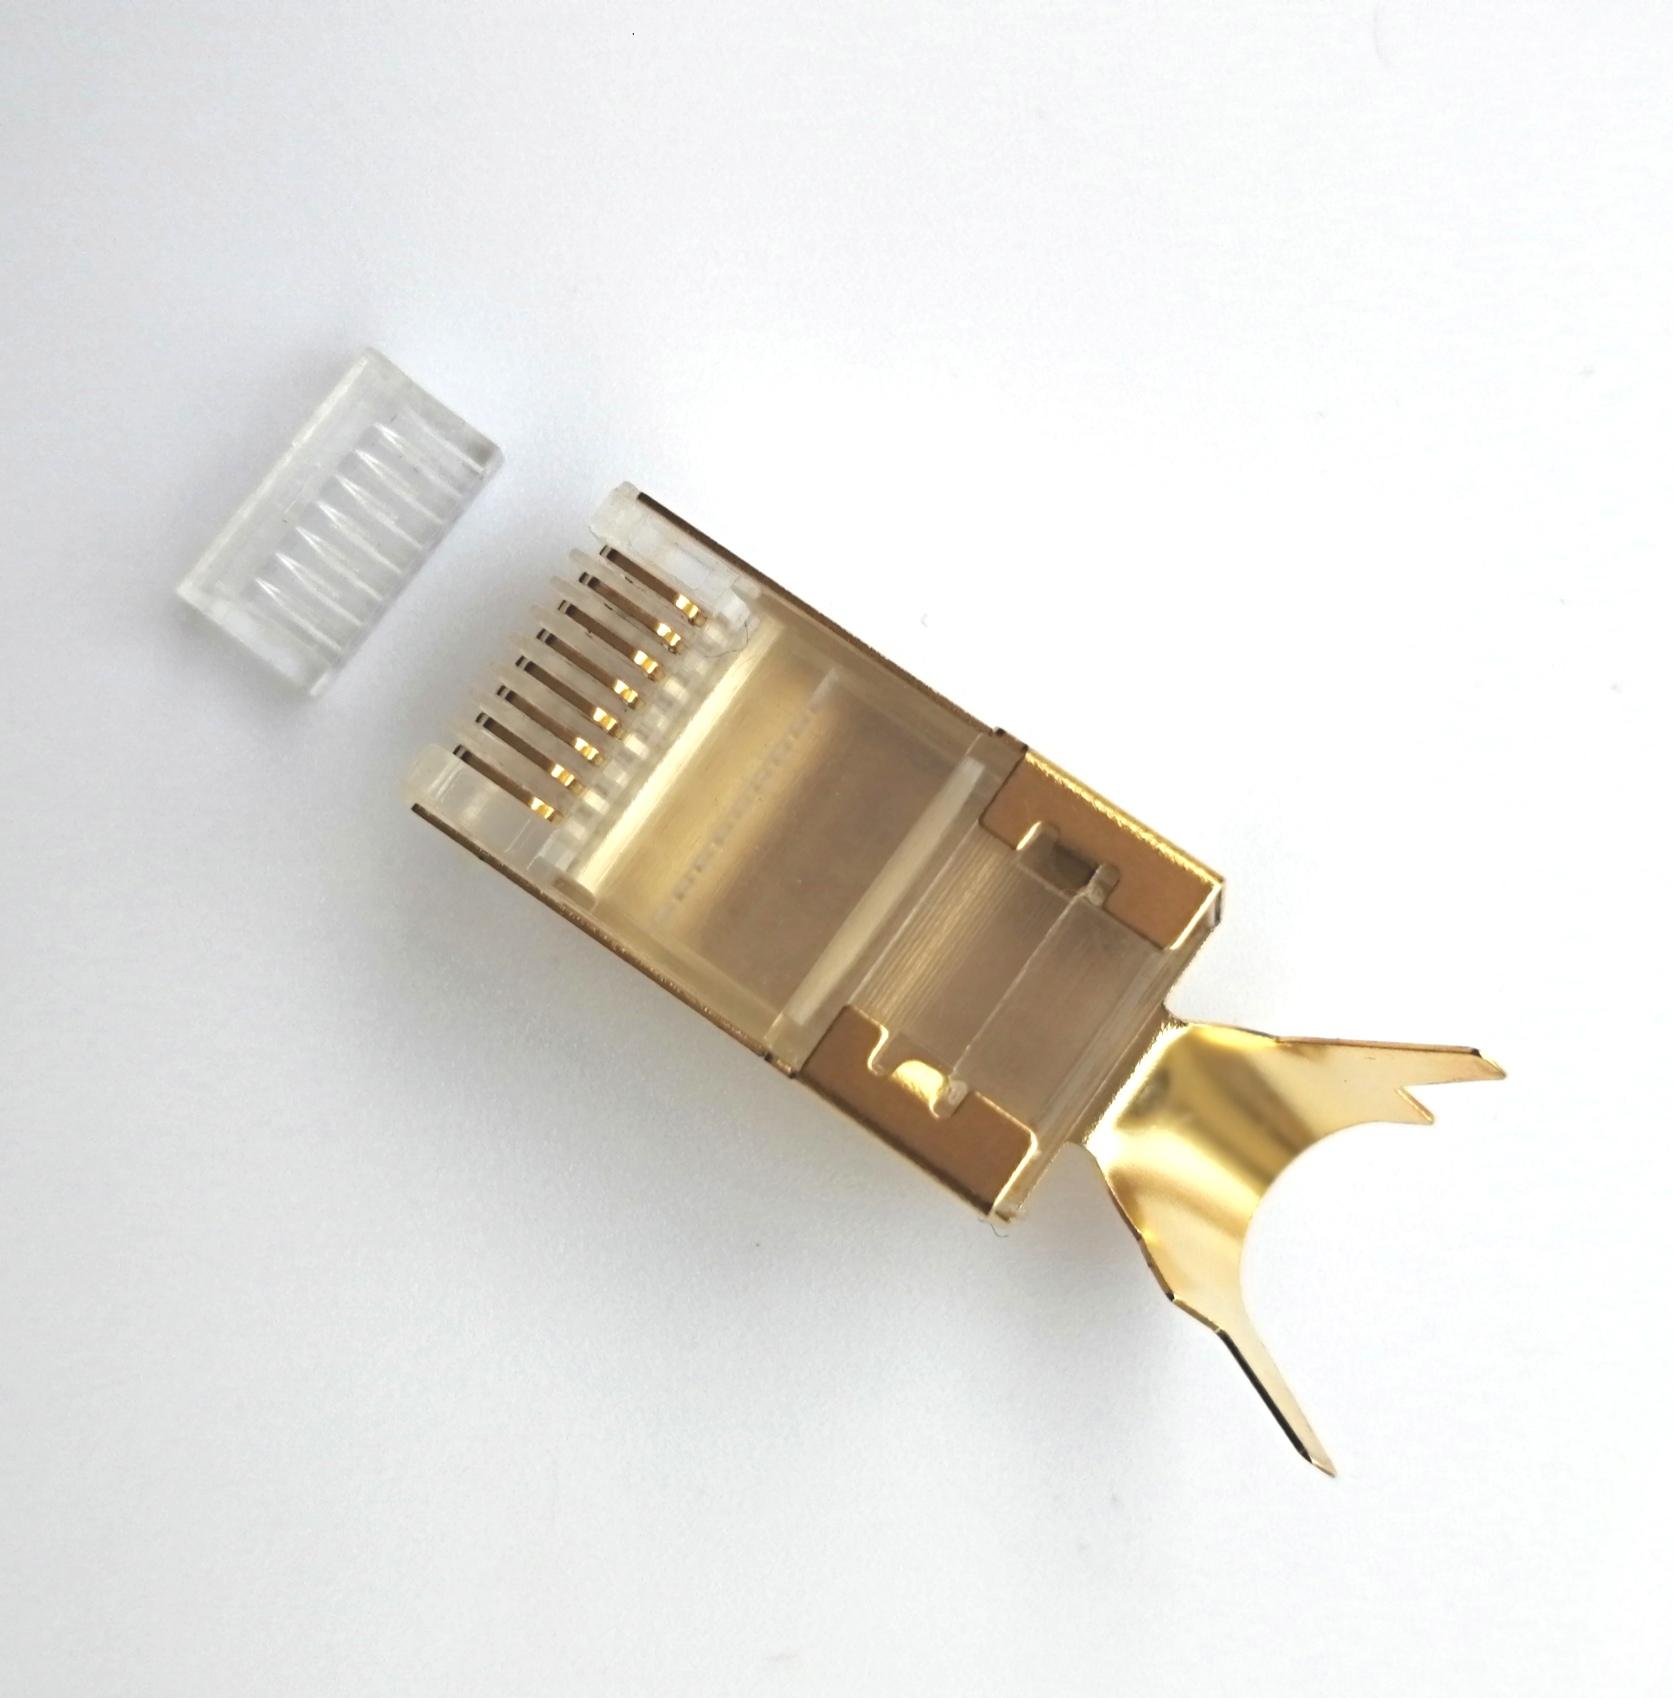 RJ45 8P8C Cat7 connector RJ45 plug with gold plating 50U 8P8C plug